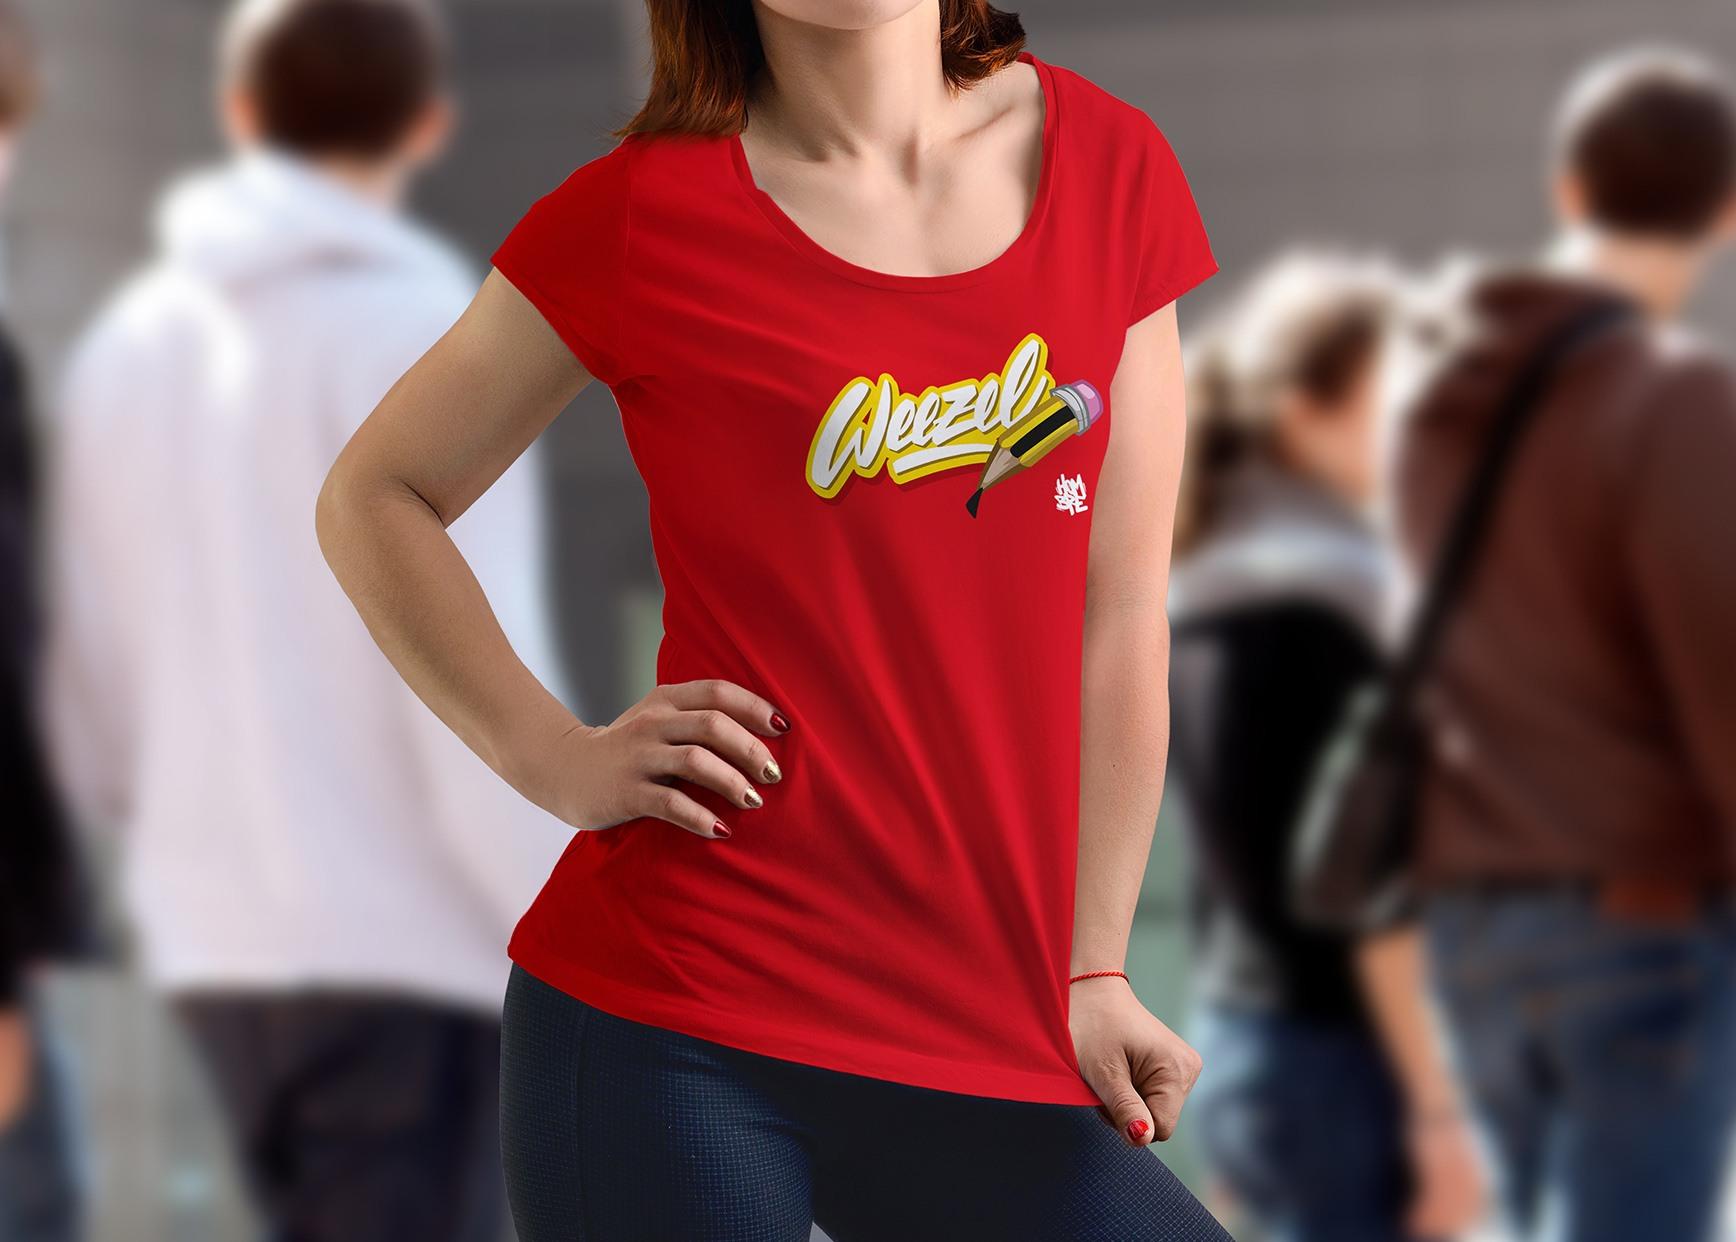 Hombre Damen Logoshirt creative weezel Rot Model render front